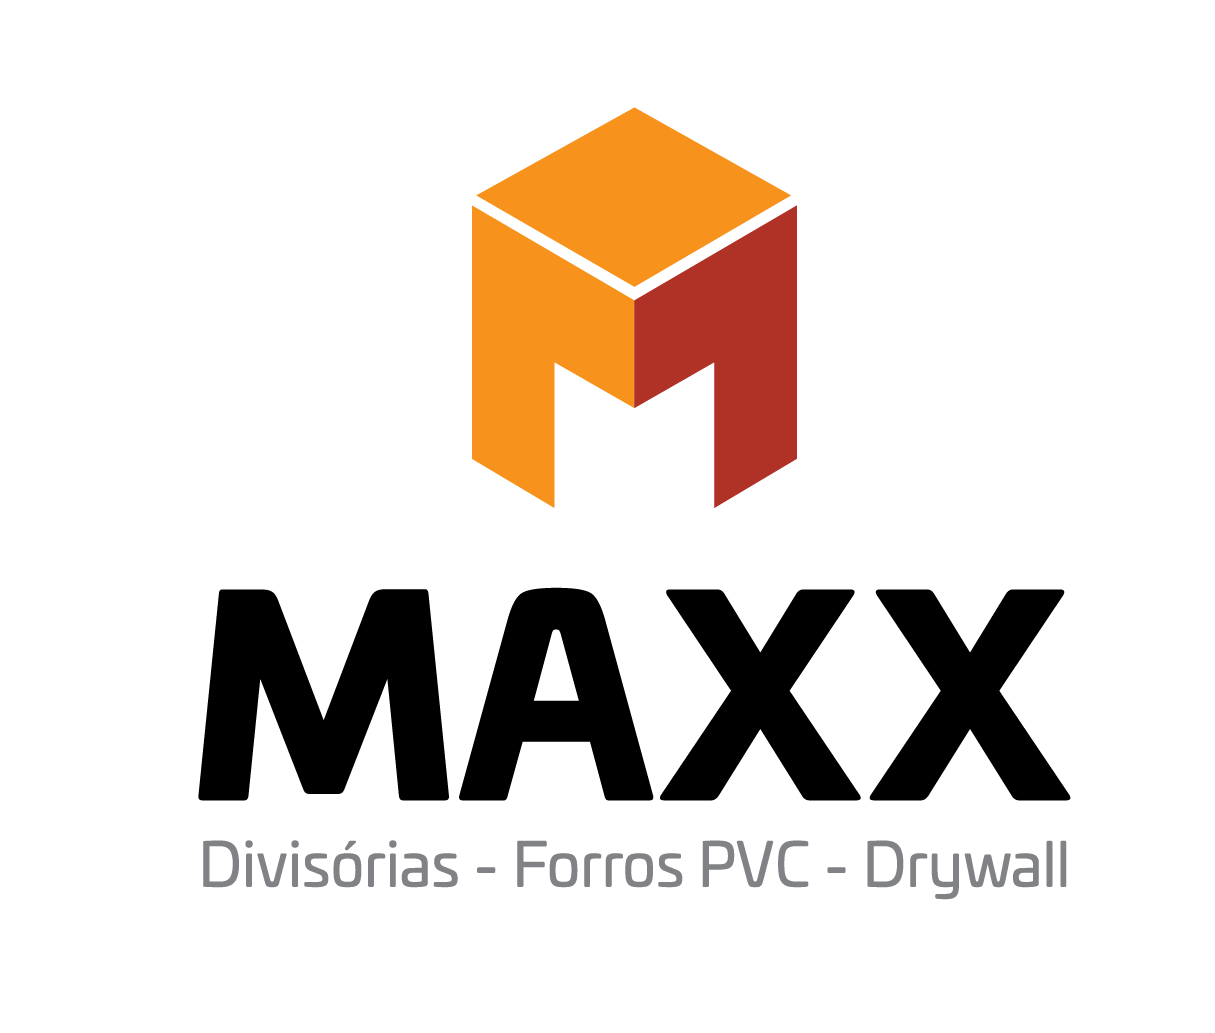 Forros de Pvc Colocado Vila Maria - Forro de Pvc Decorado - Maxx Forro